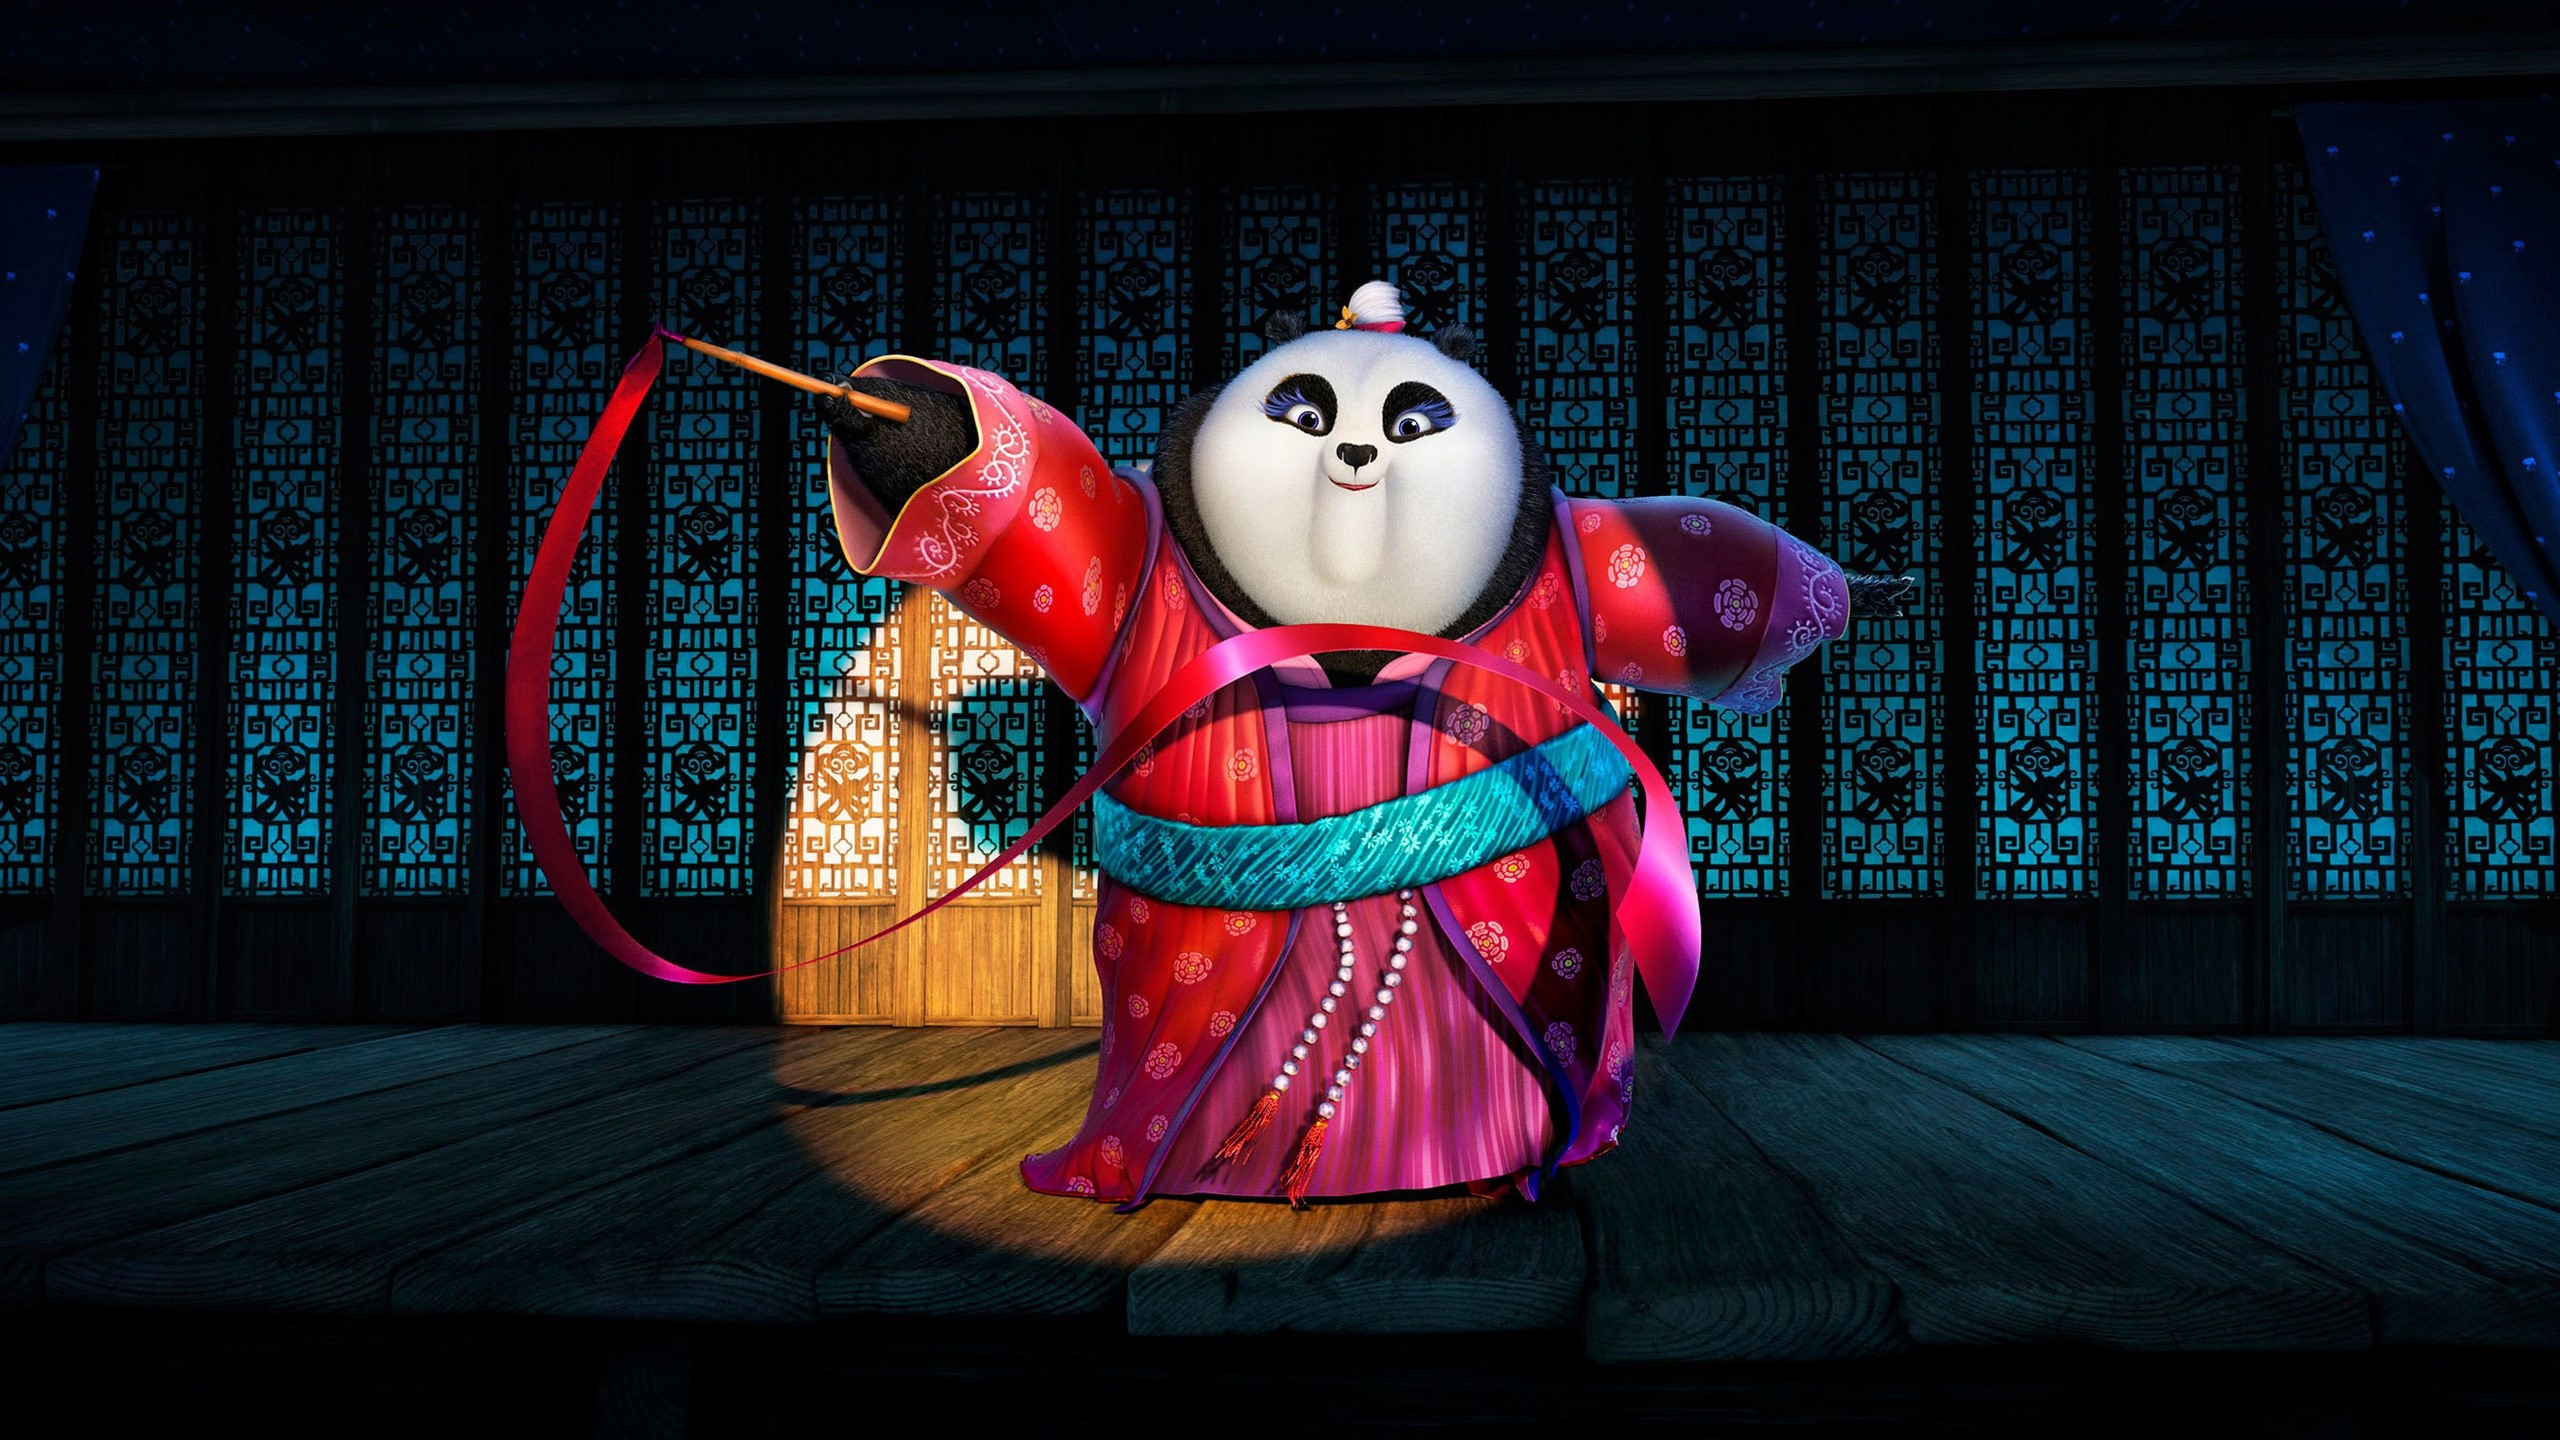 Fondo de pantalla de Mei Mei de Kung fu panda 3 Imágenes